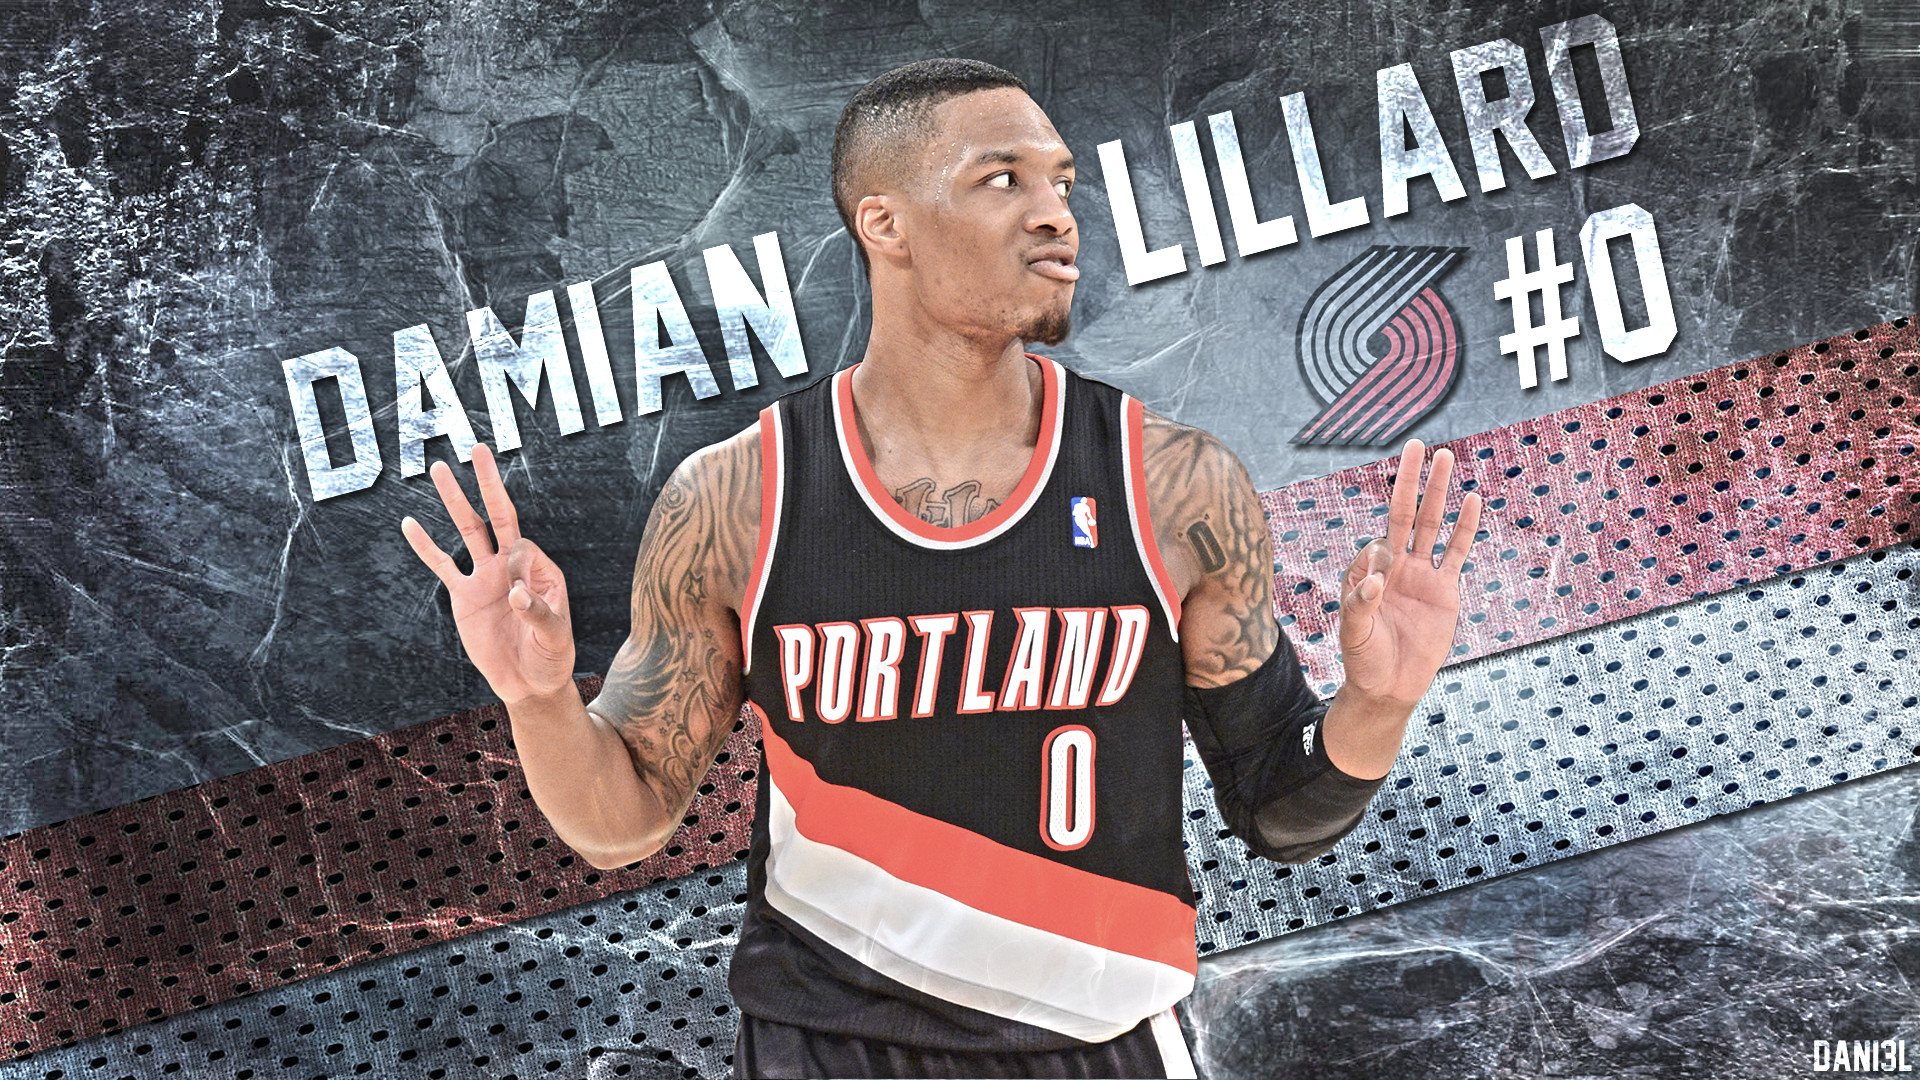 NBA, Portland, Trail Blazers, Portland Trail Blazers, Damian Lillard,  Basketball Wallpapers HD / Desktop and Mobile Backgrounds